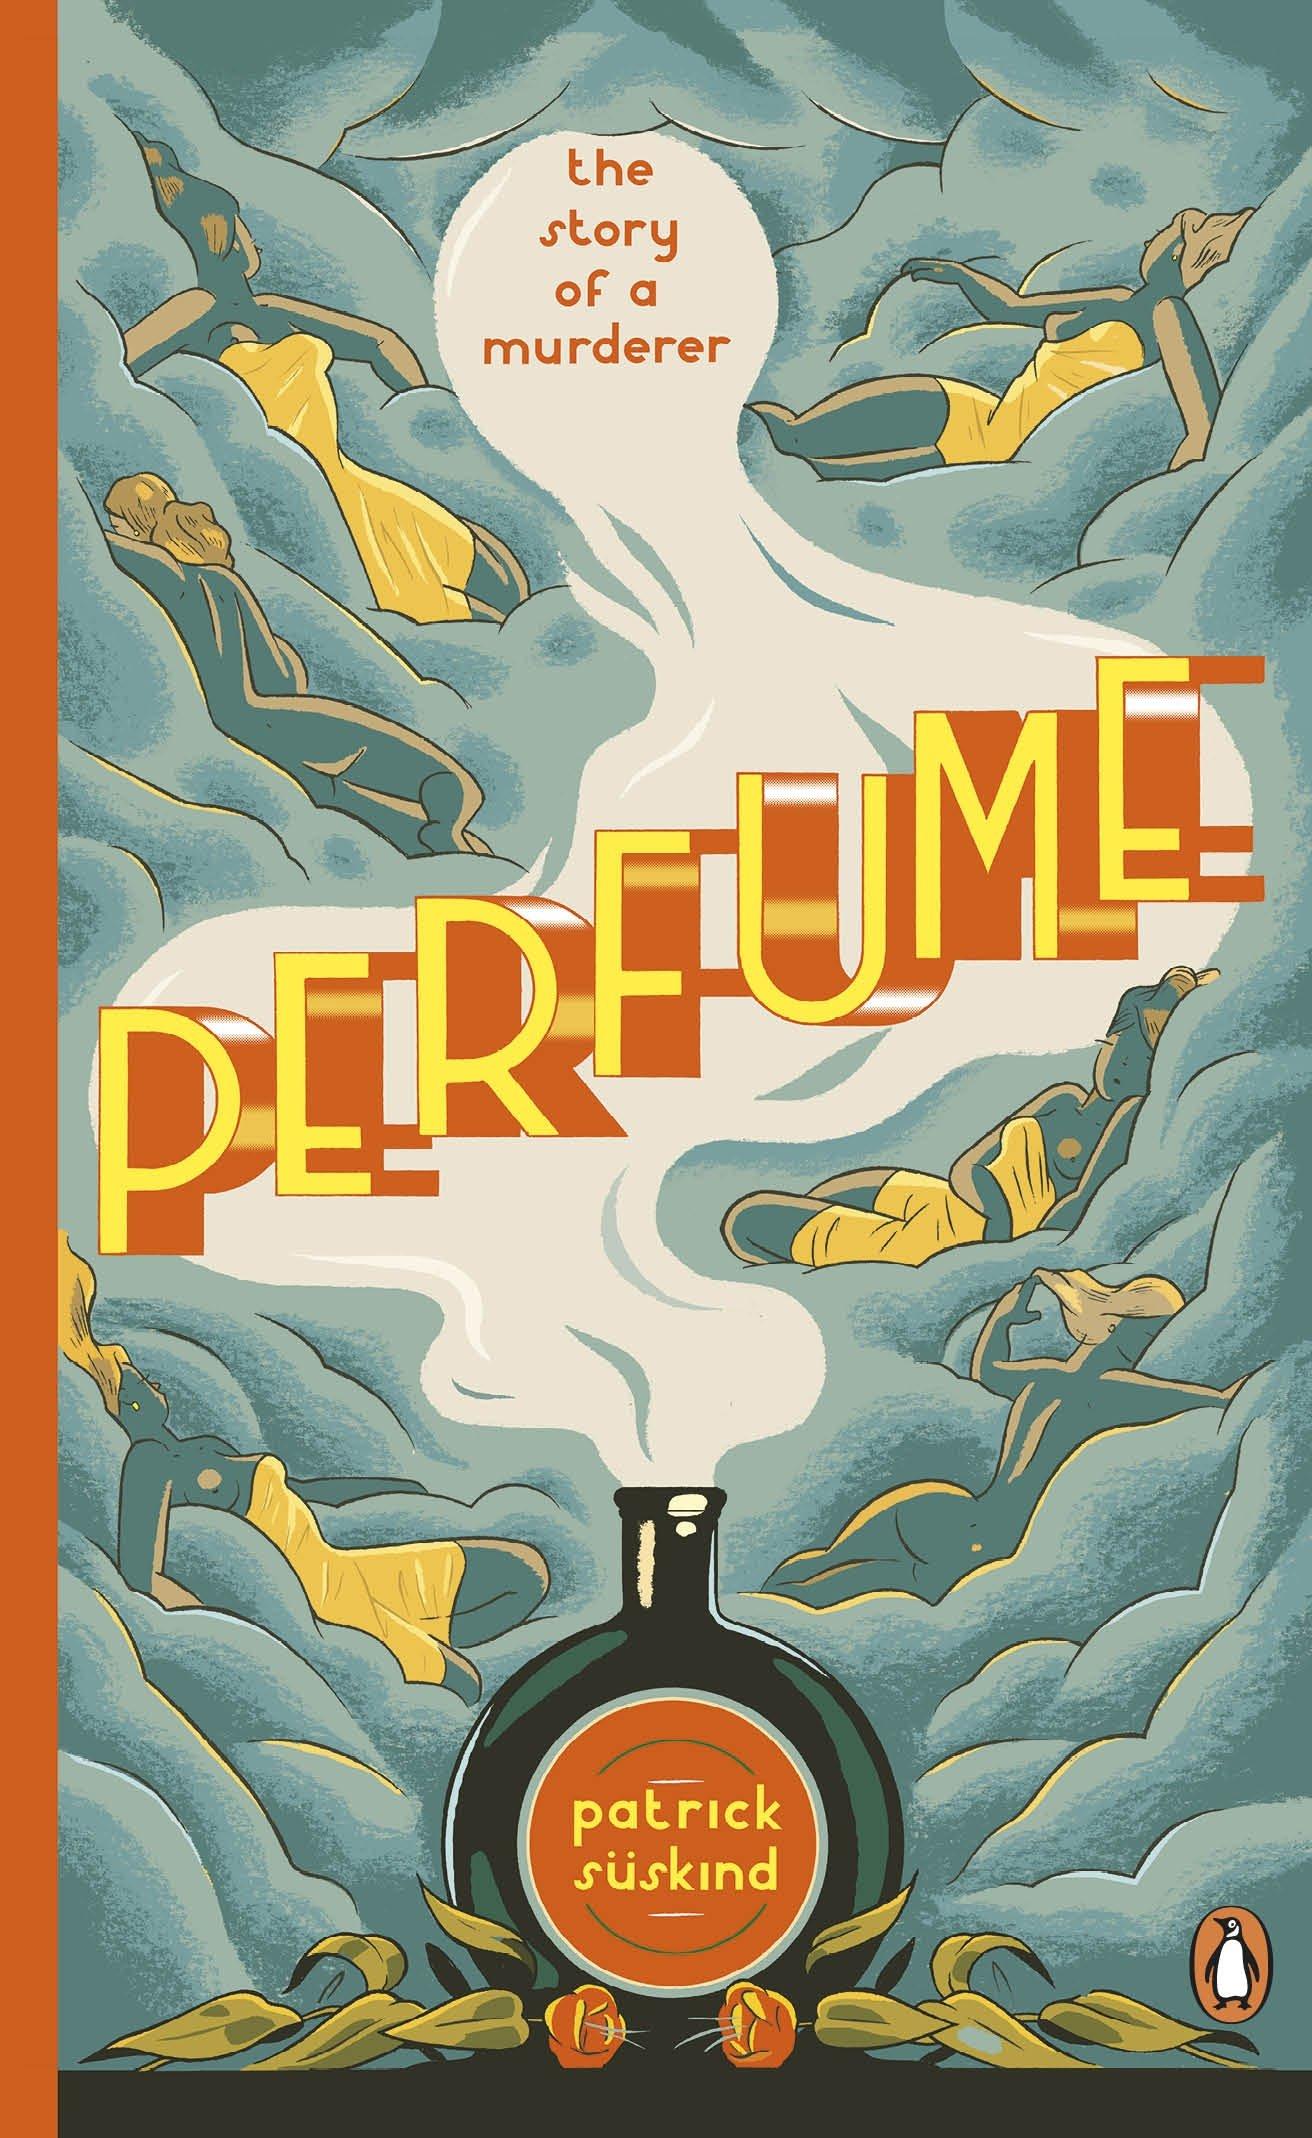 Perfume Patrick Suskind Pdf Download